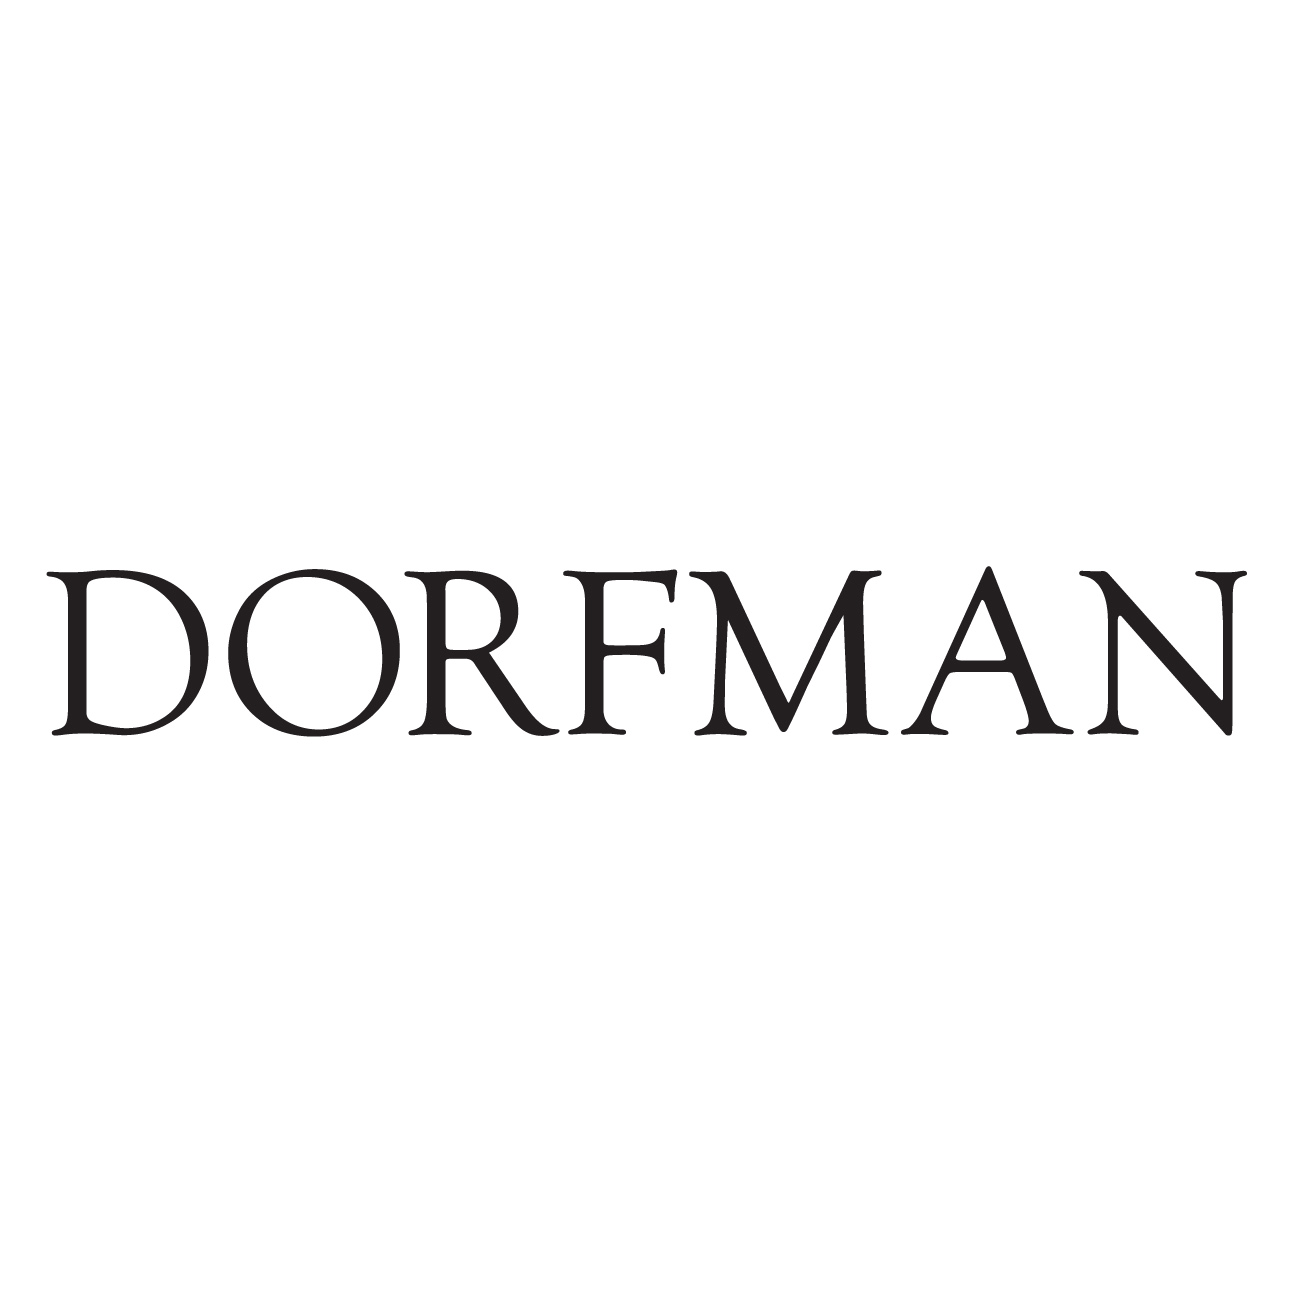 DORFMAN_THUMB.jpg